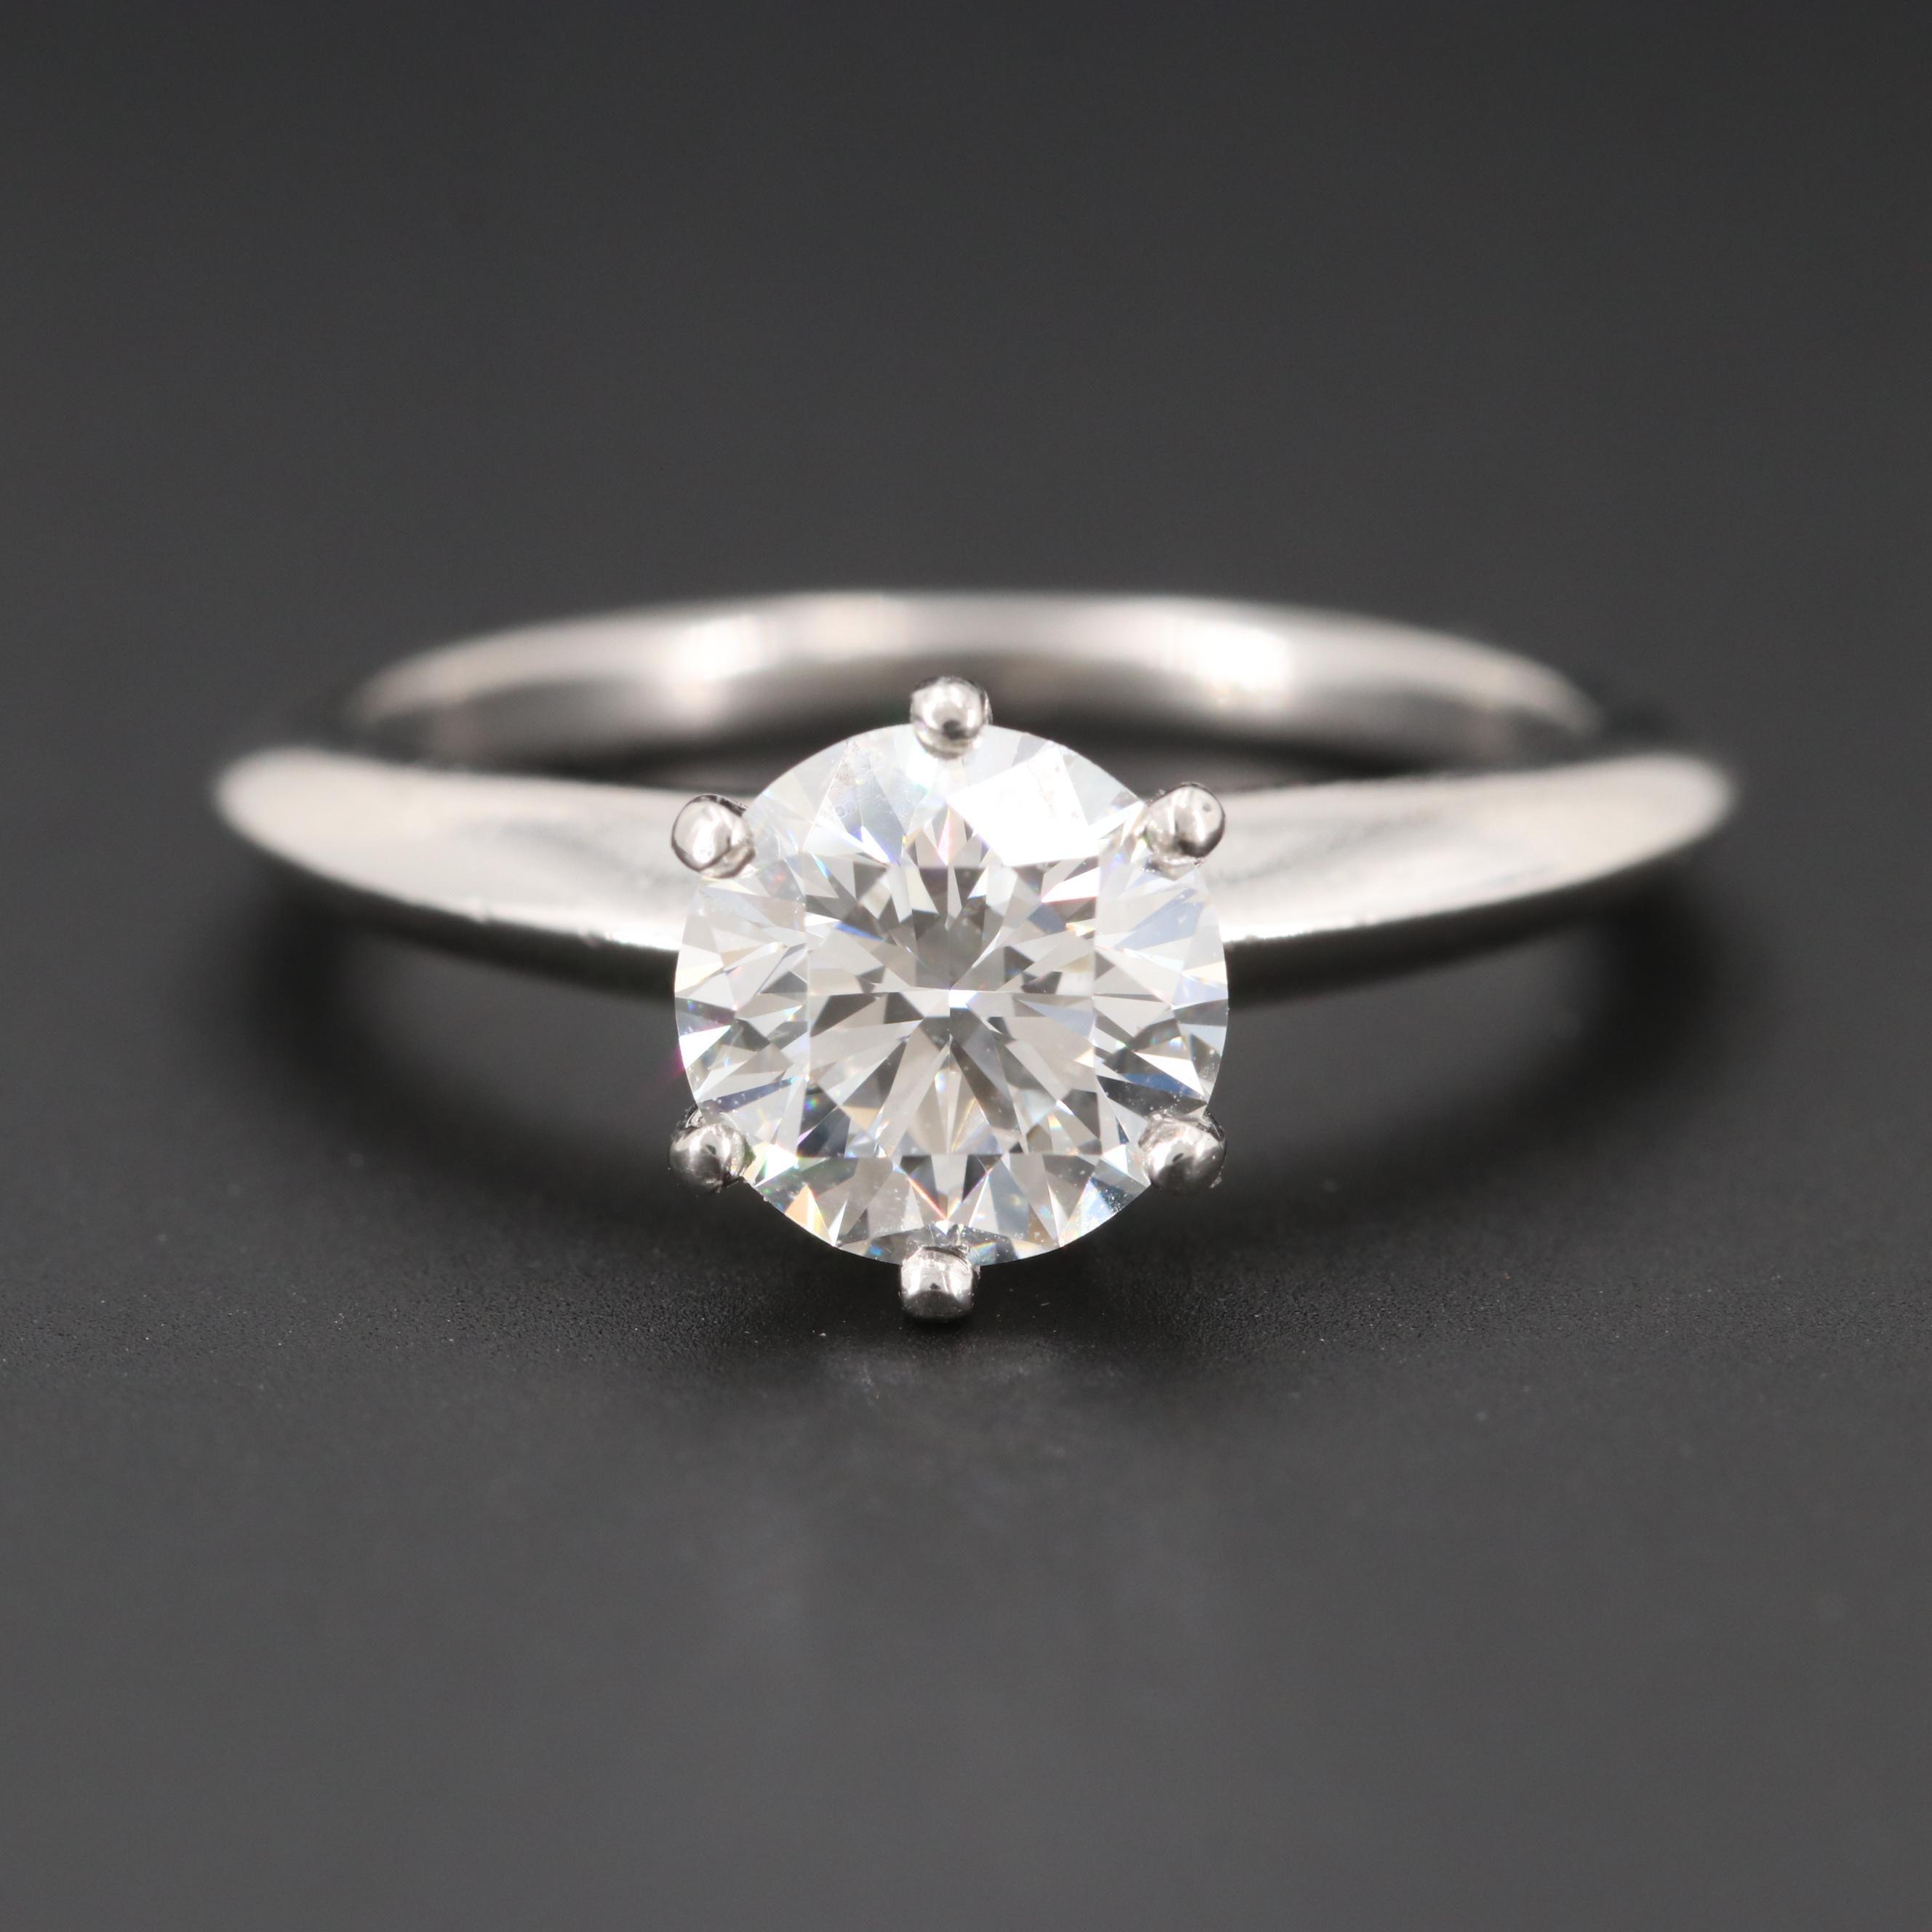 Tiffany & Co. Platinum 1.26 CT Diamond Solitaire Ring